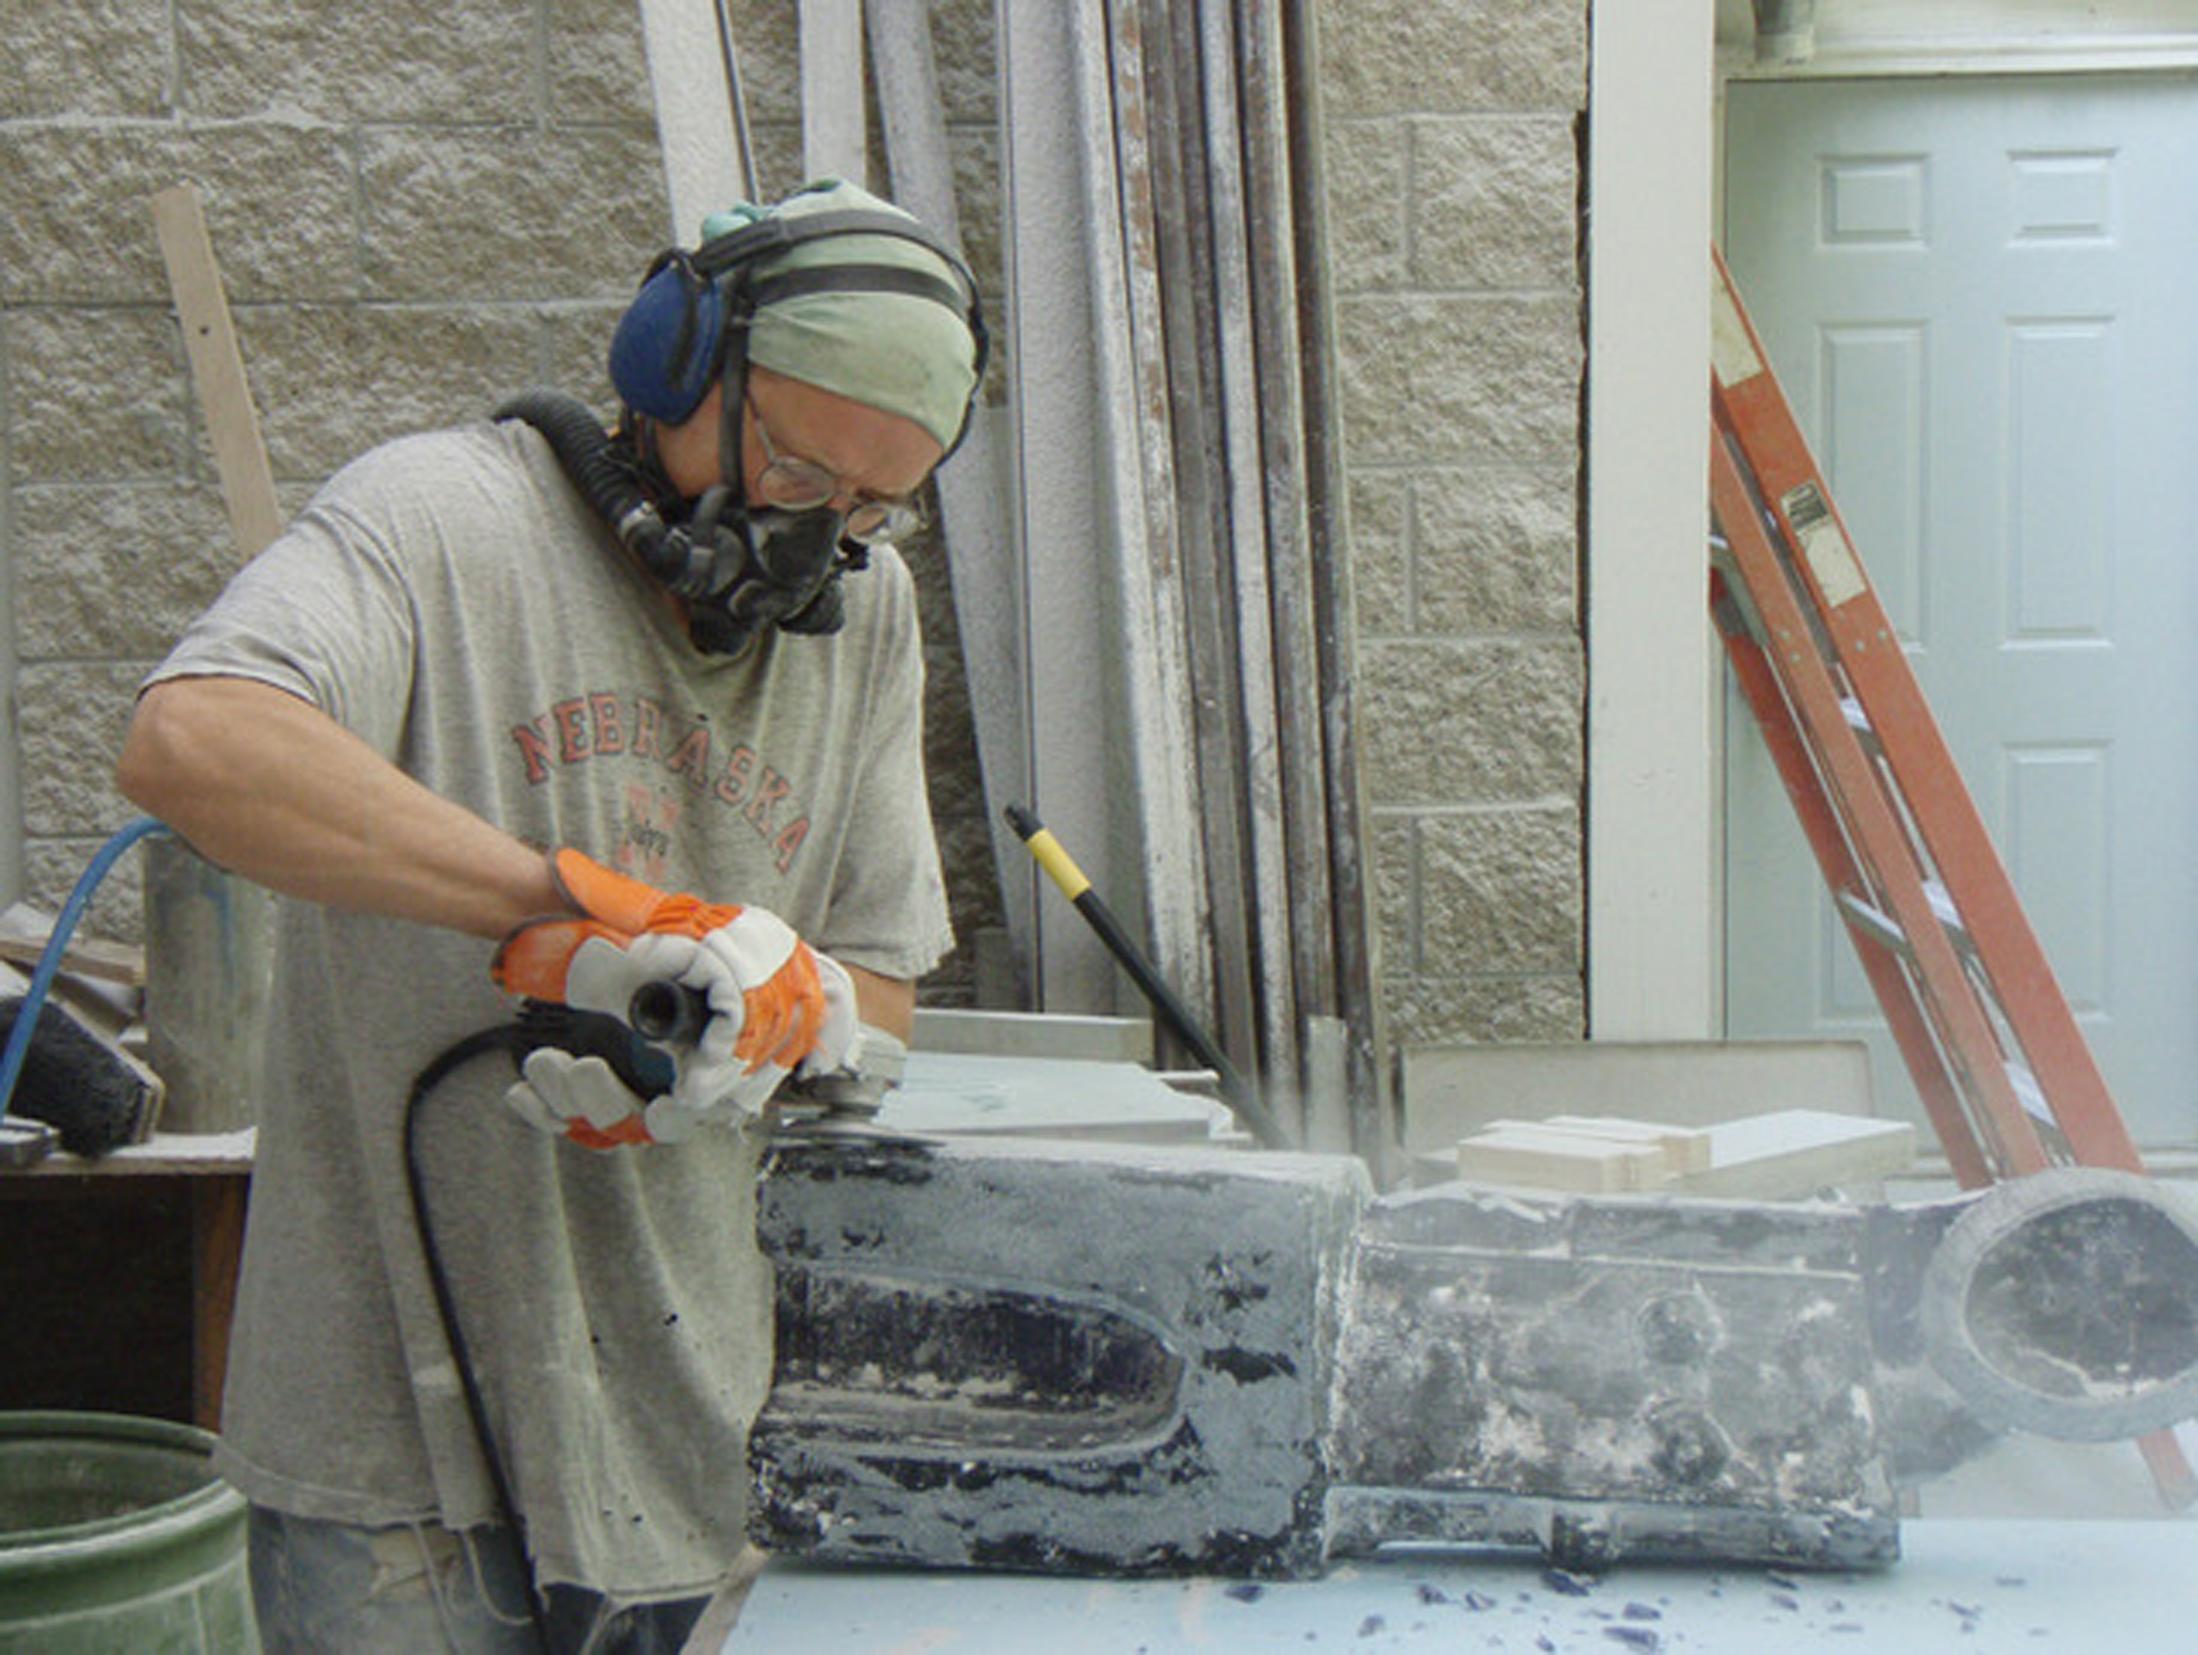 Rick grinding glass